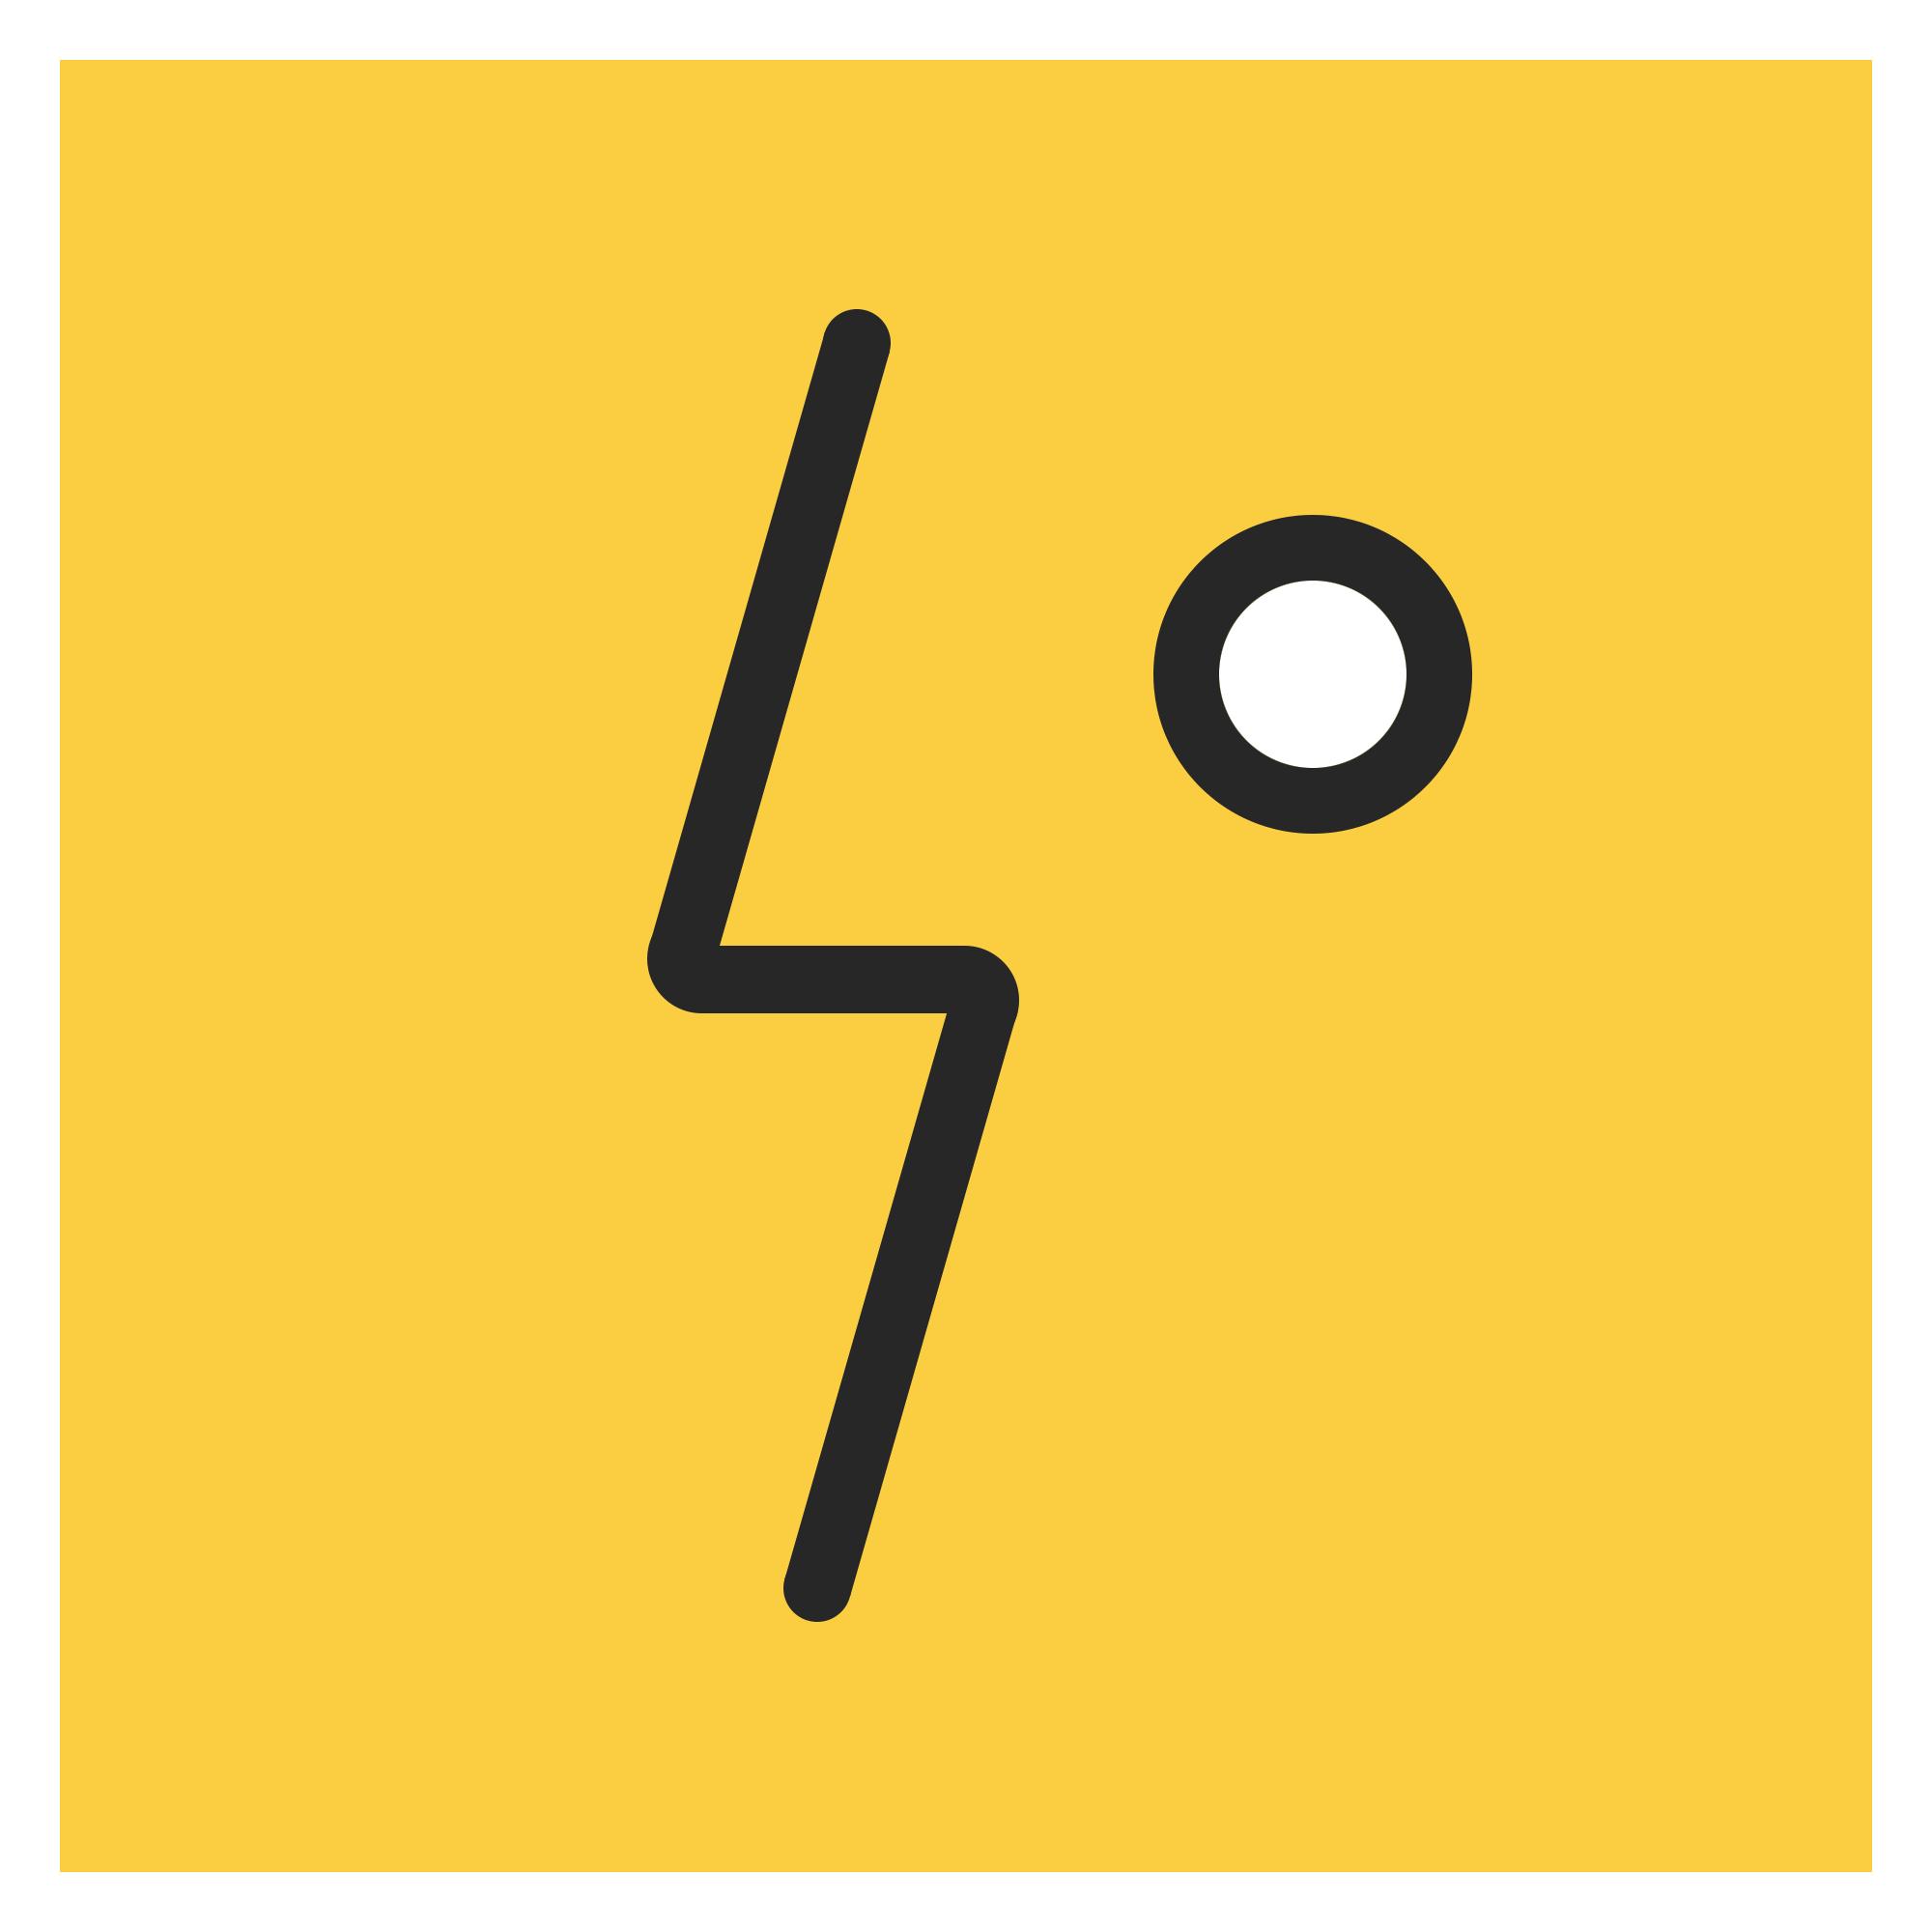 多面logo